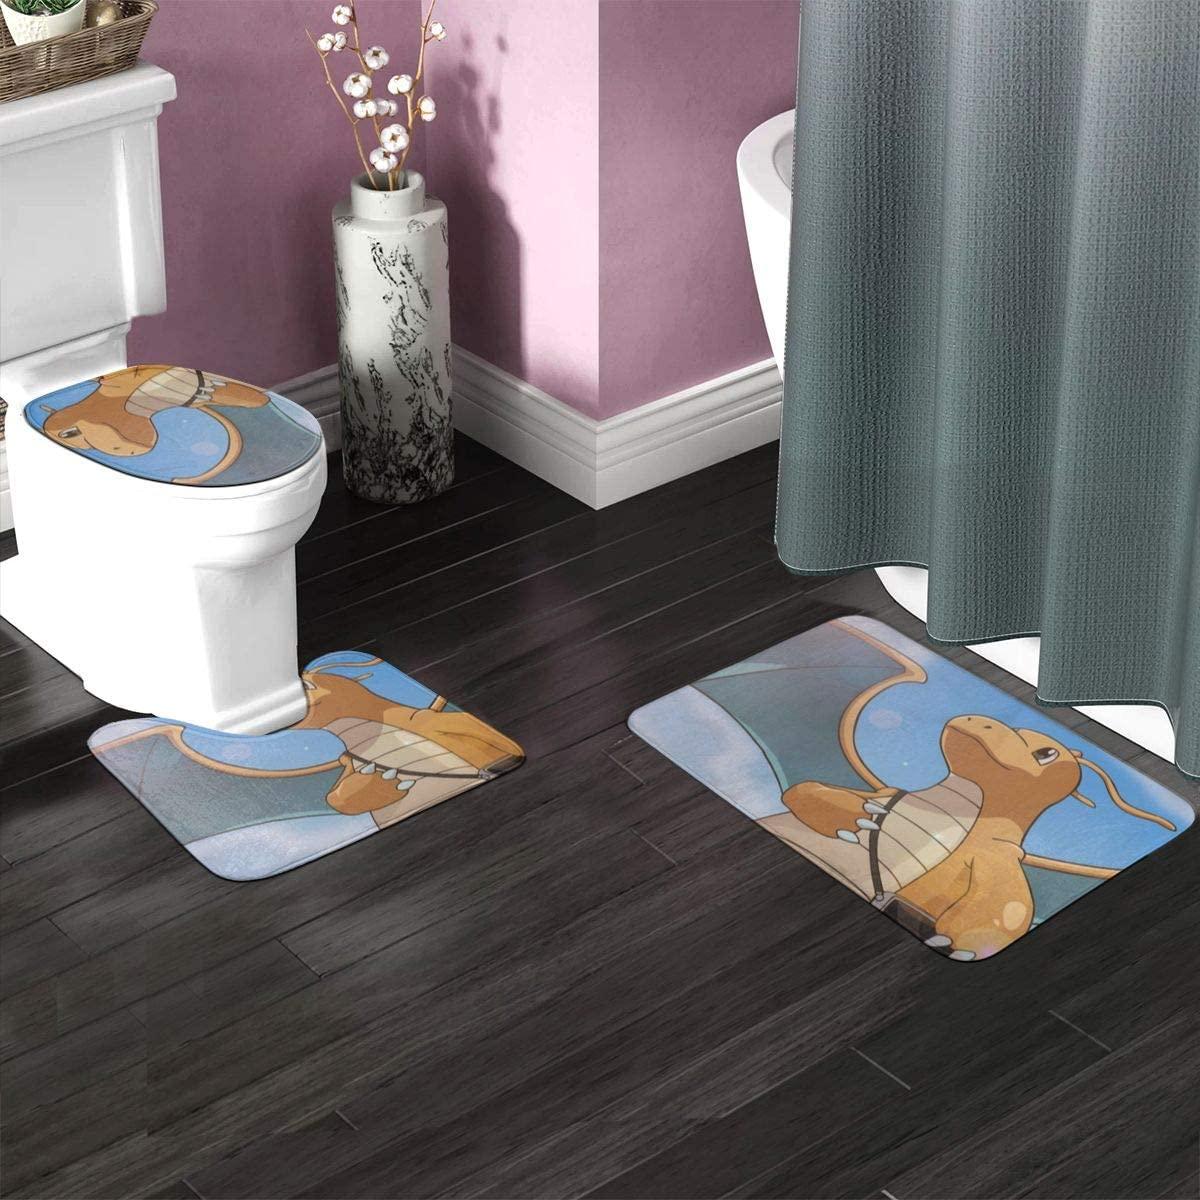 3PC Bathroom Rug Set 23.6